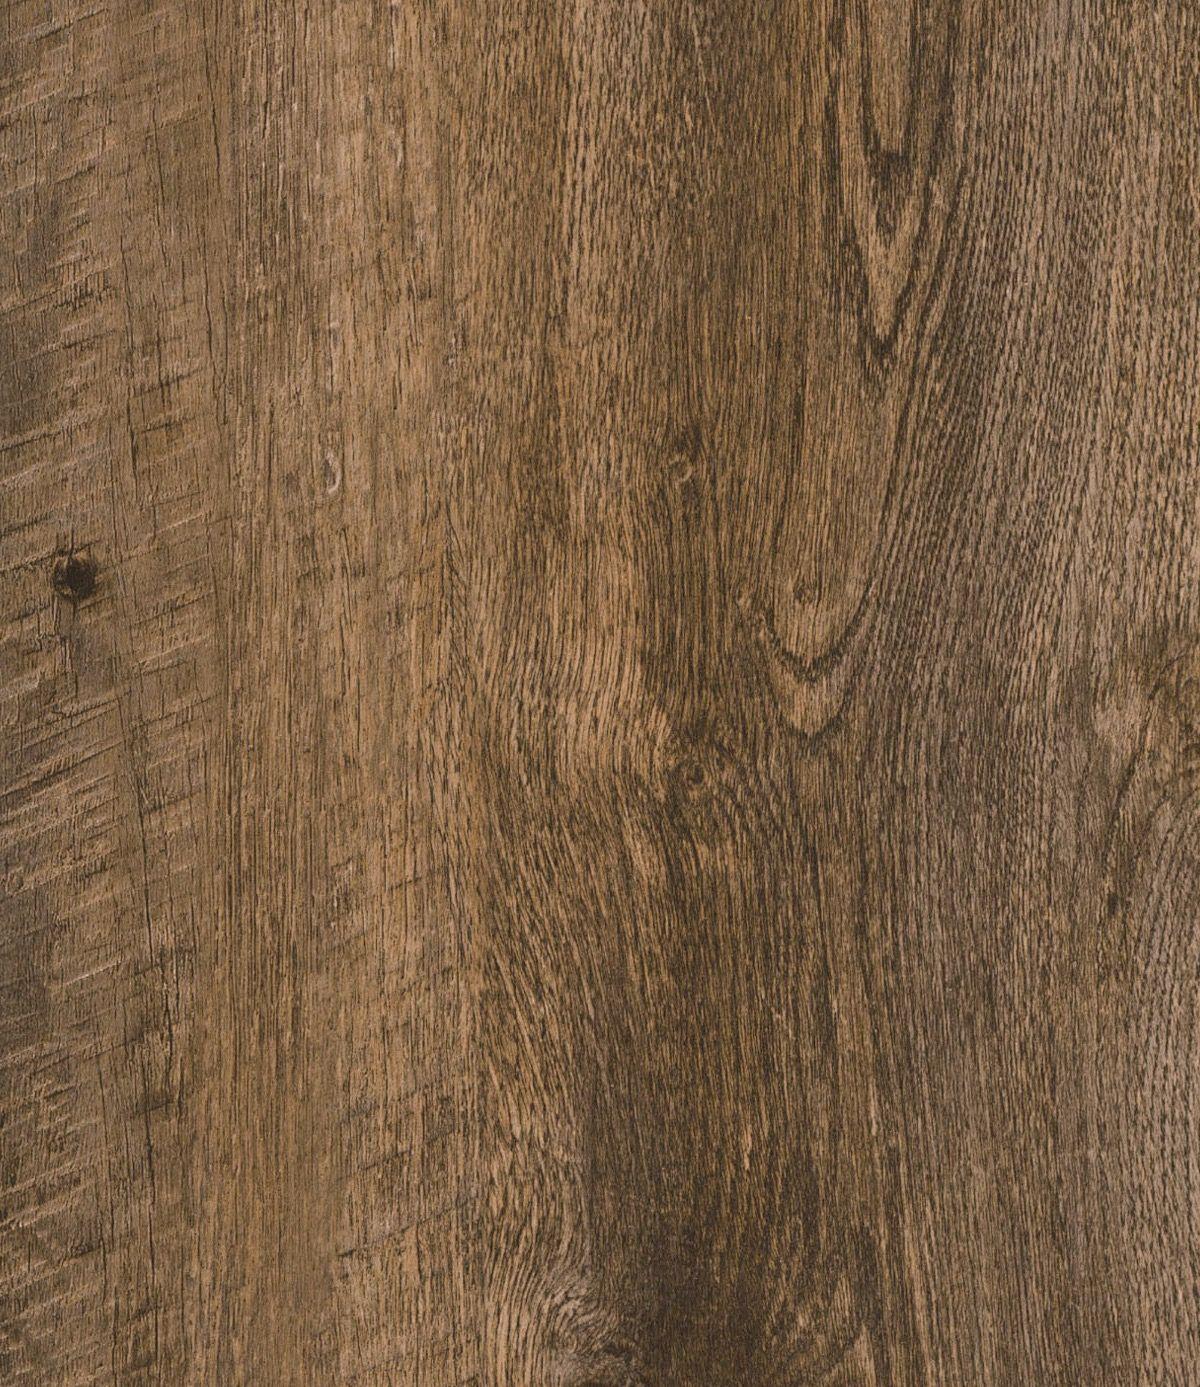 Smoked Antique Oak Hand Scraped Flooring Flooring